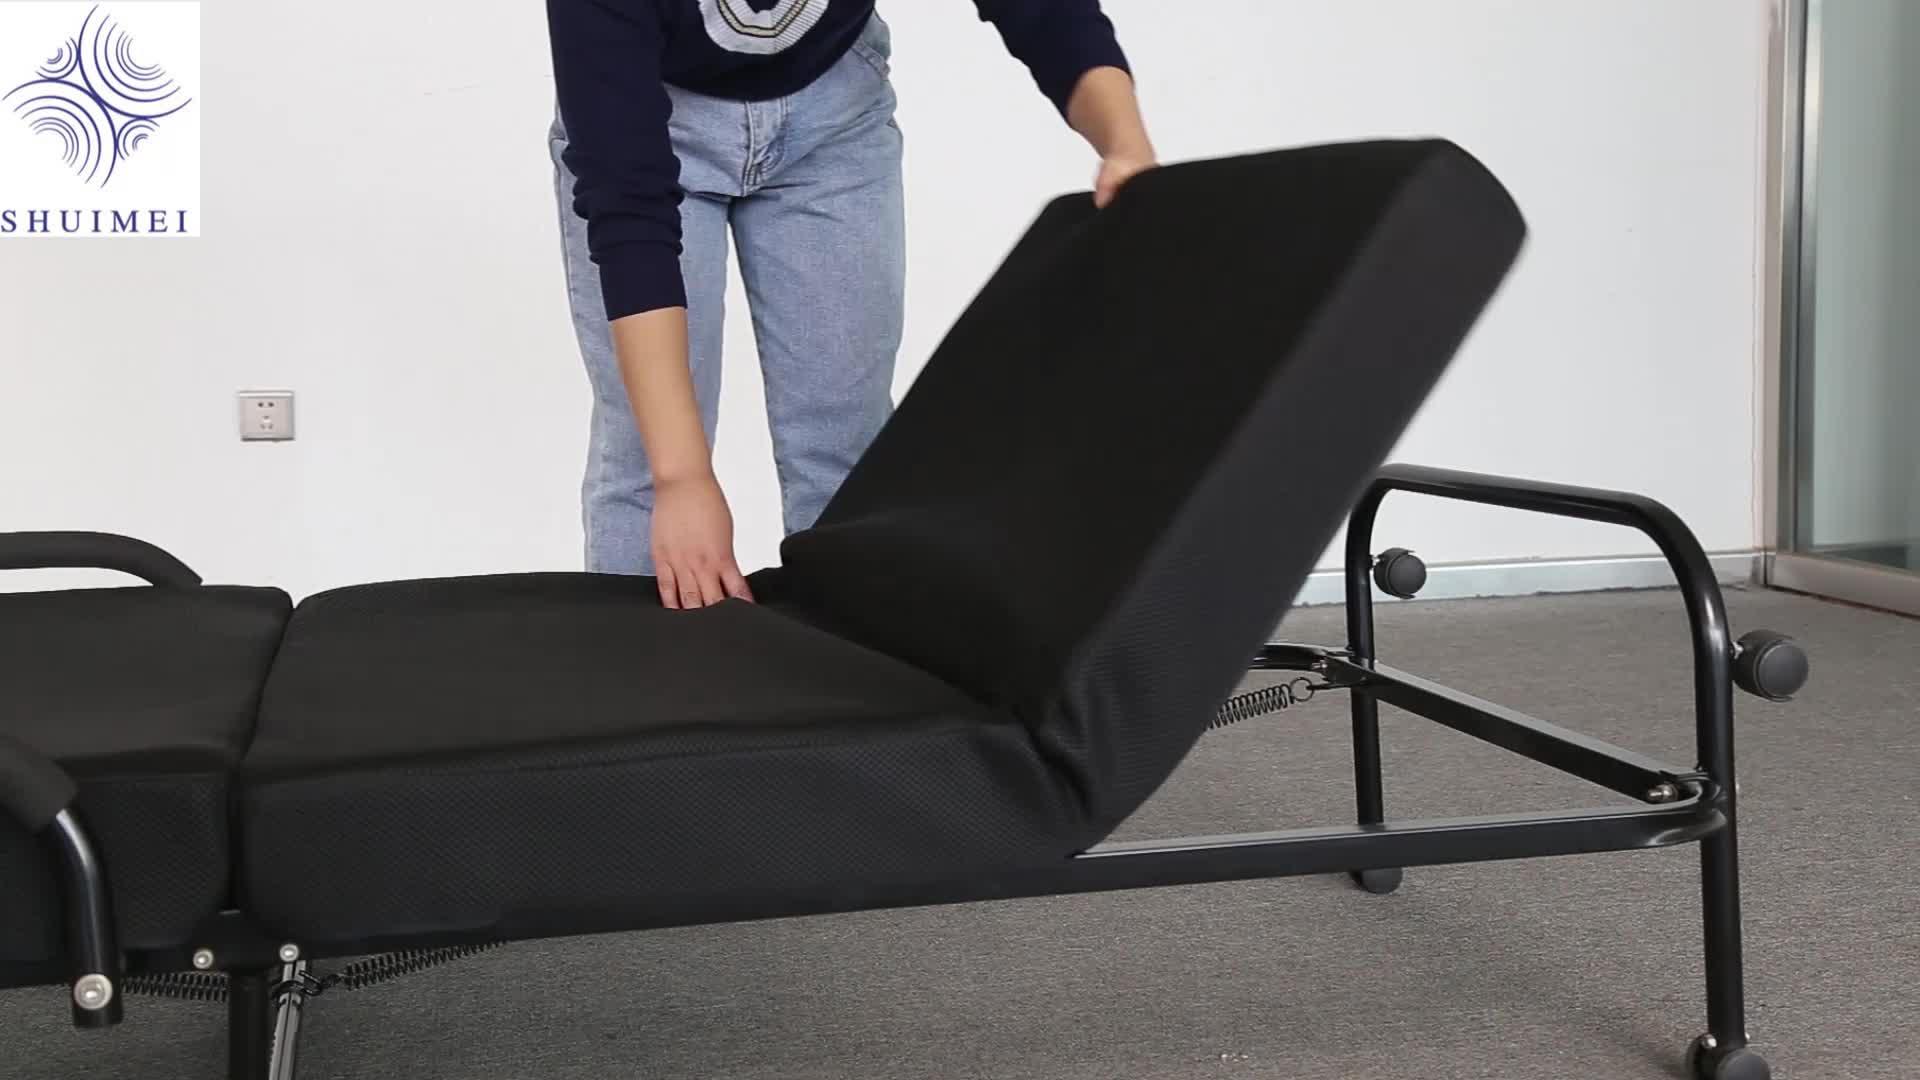 - Metal Folding Bed Memory Foam Plus Air Mesh Fabric Cover Spare